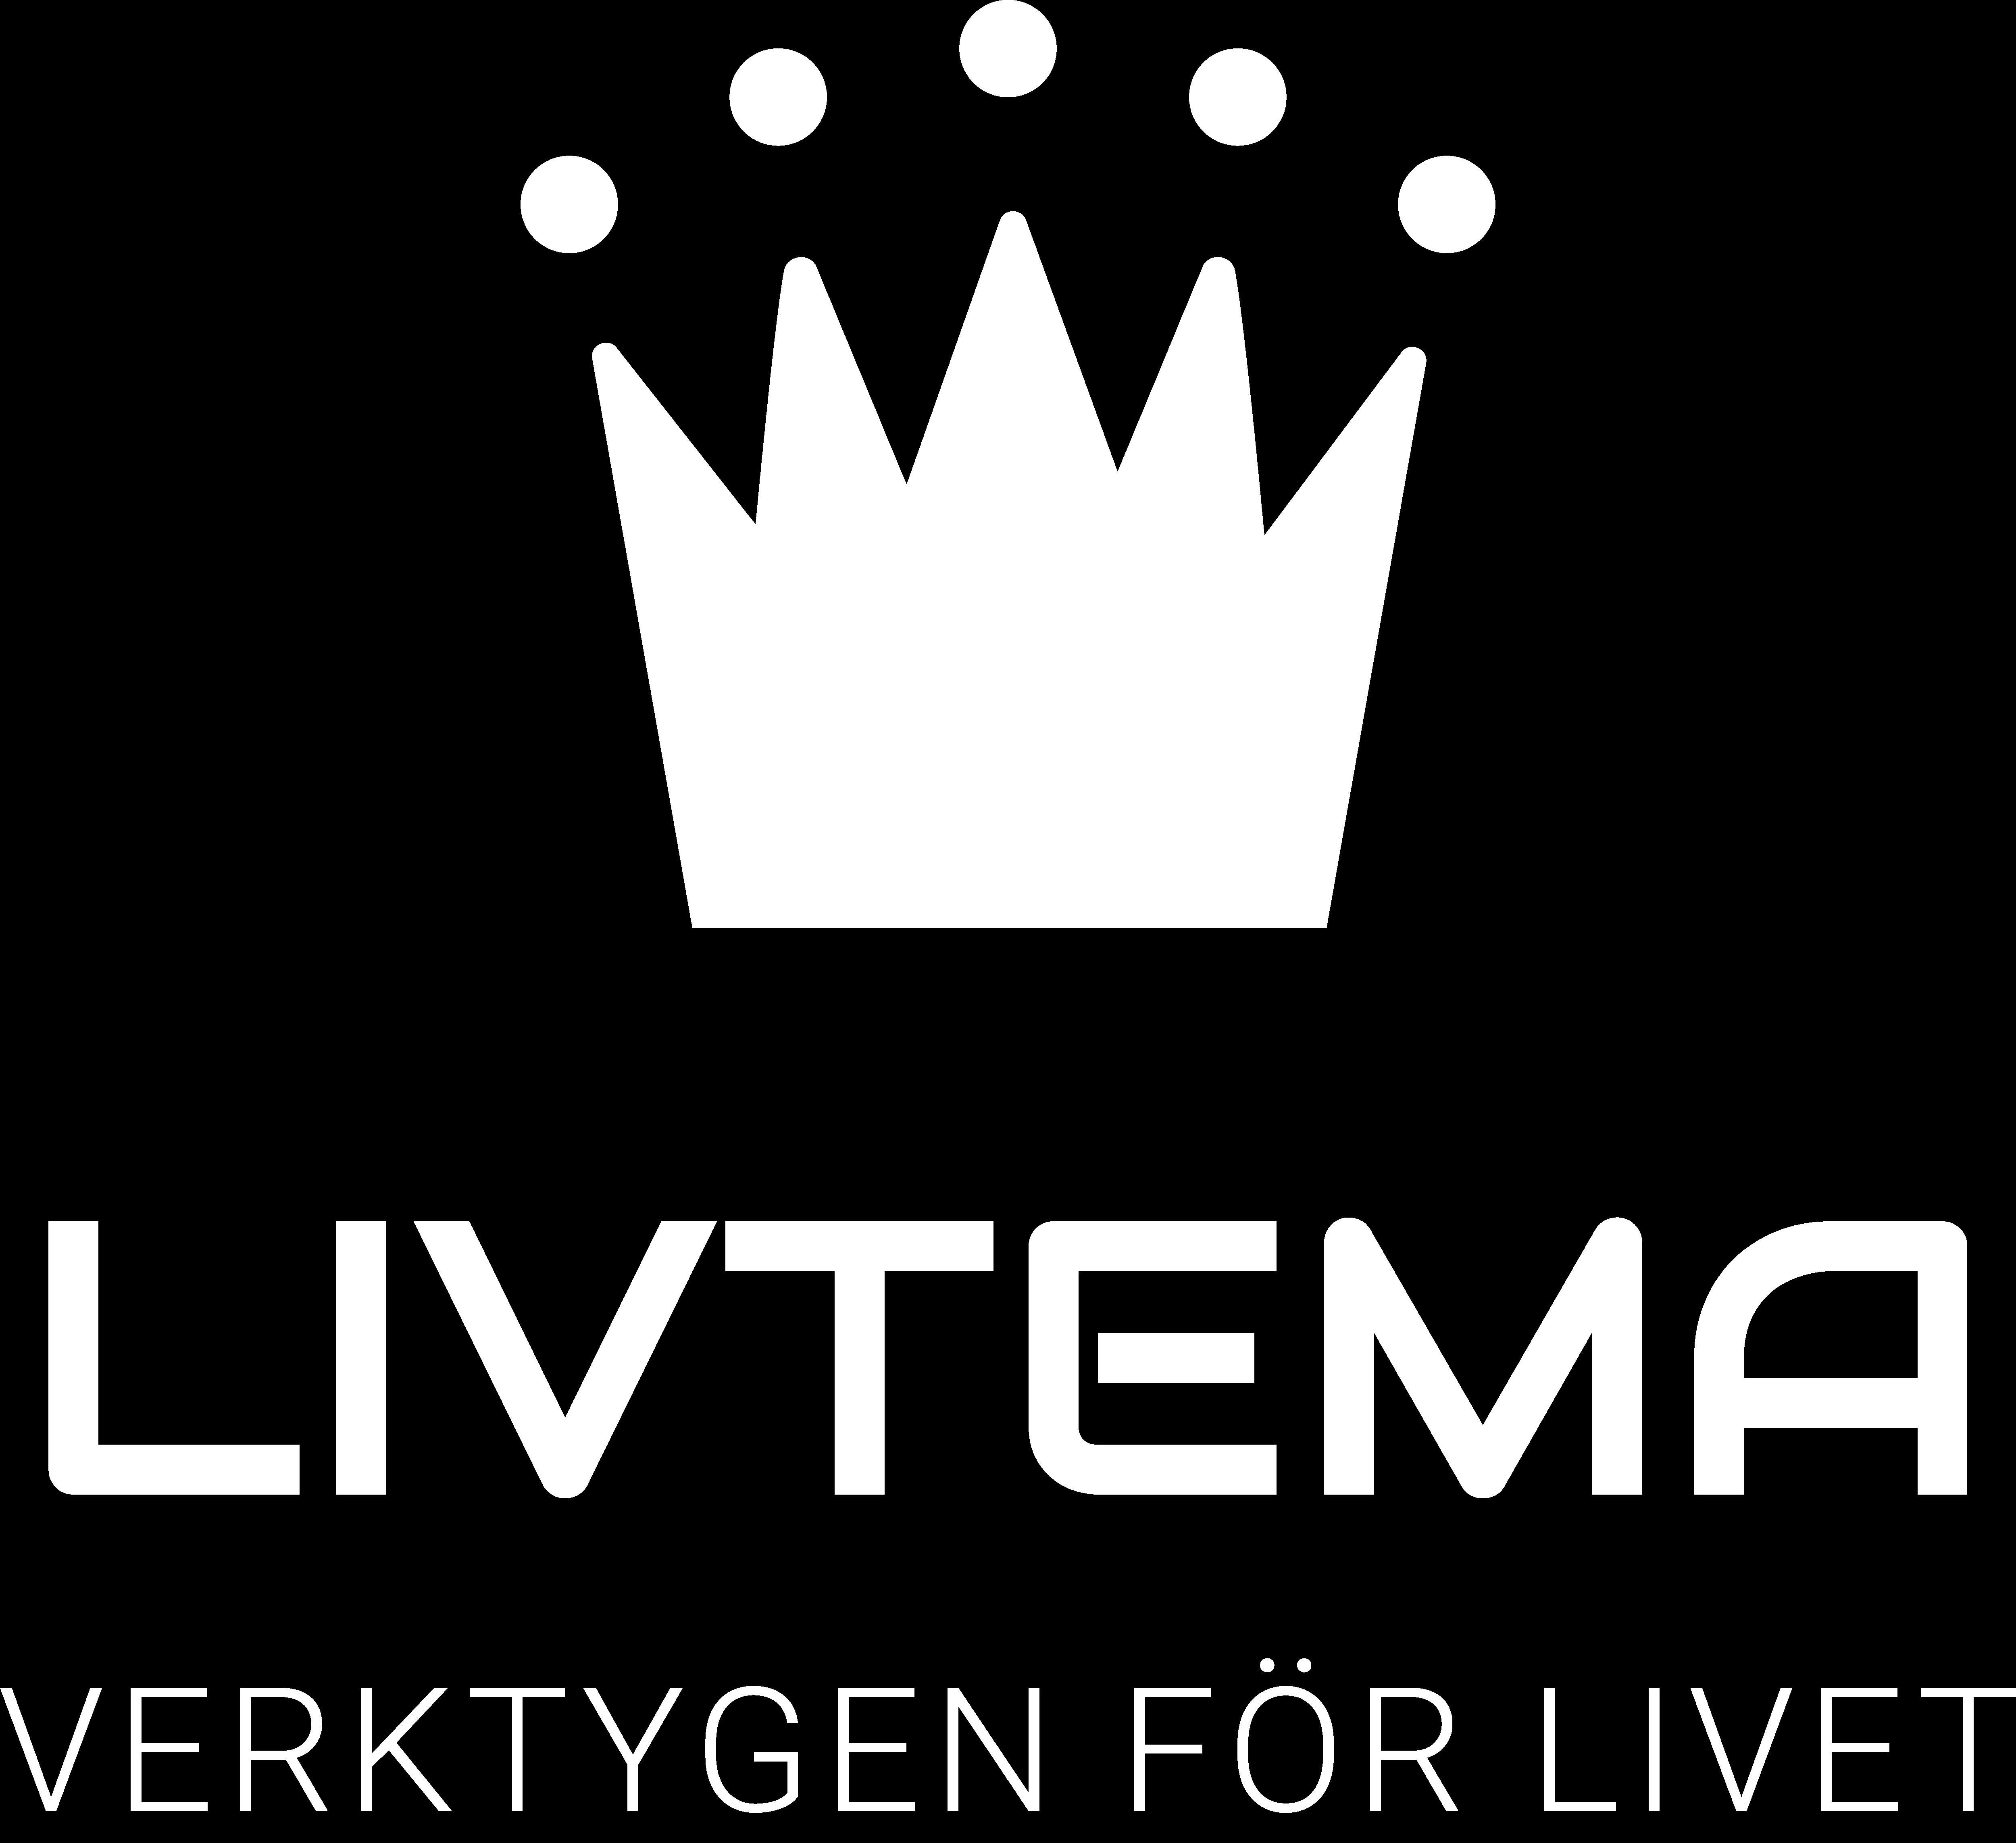 Livtema